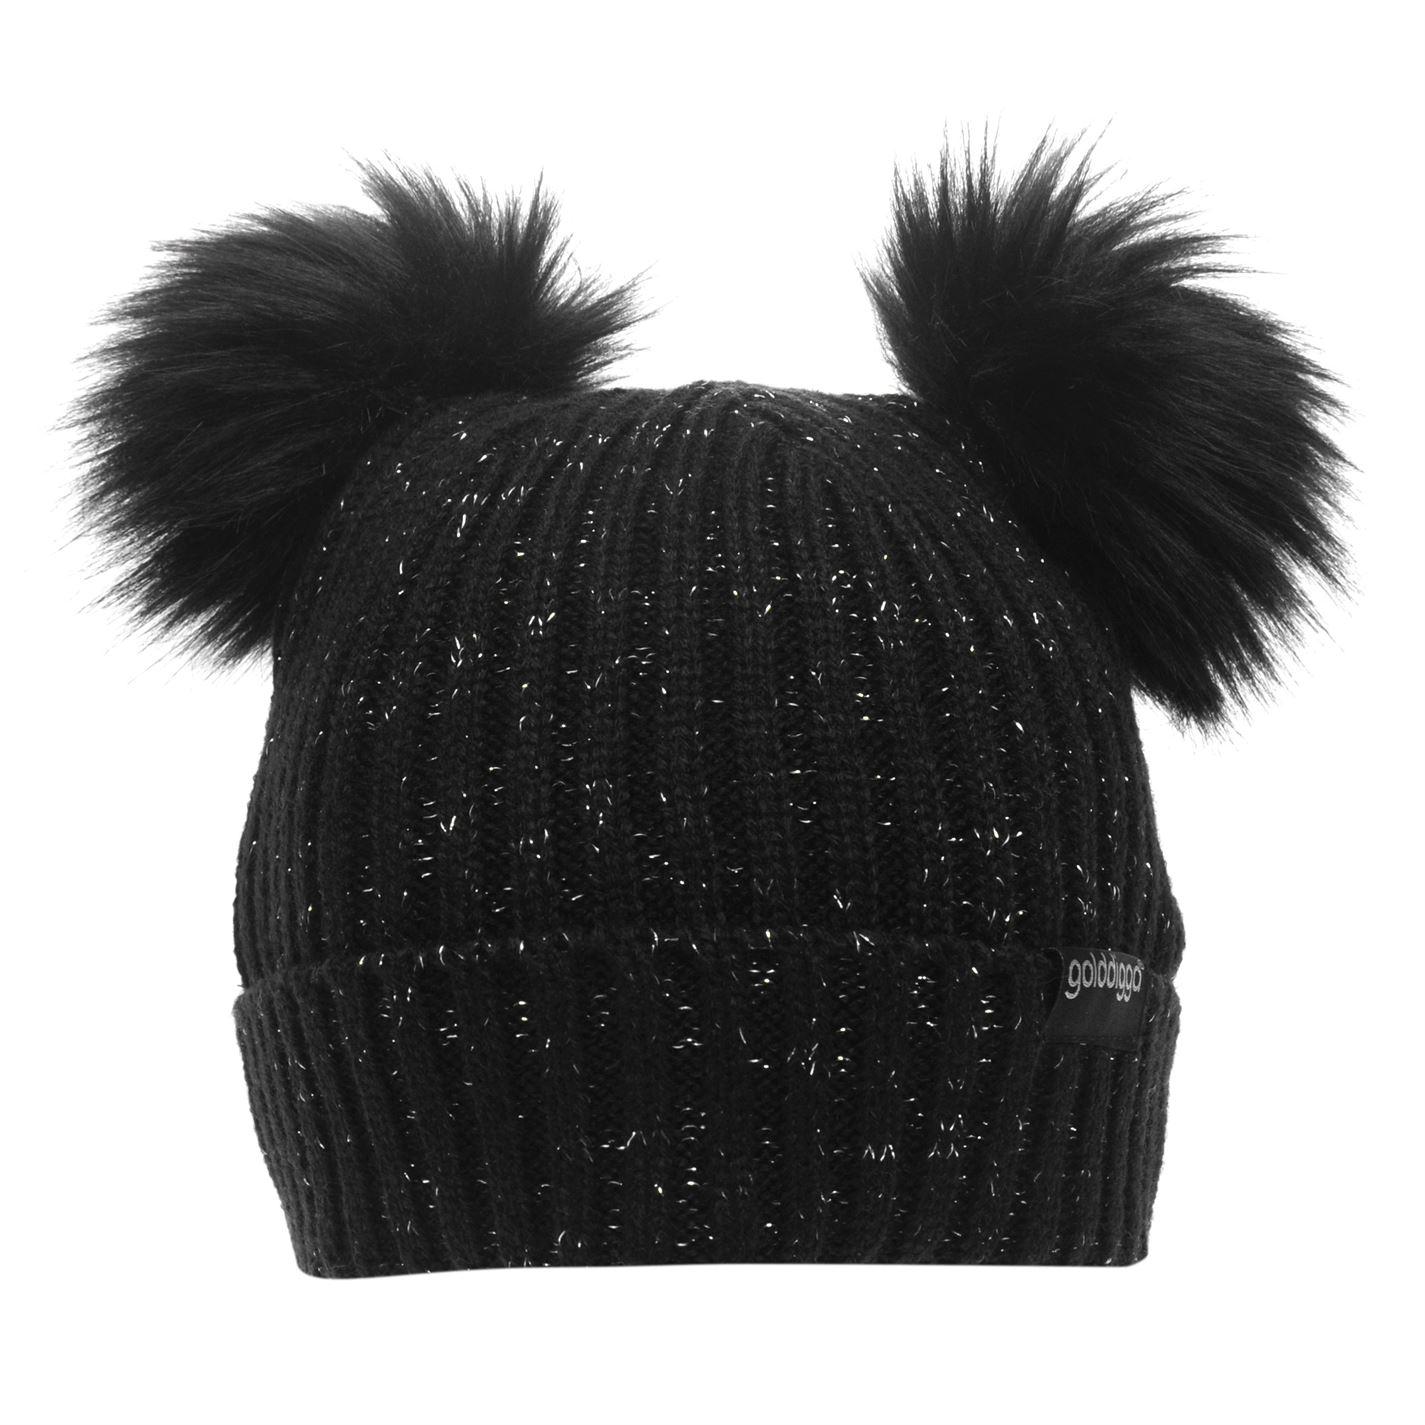 2c06301a81c0d Golddigga-Rainer-Hat-Girls-Beanie-Glitter-Knitwear thumbnail 4